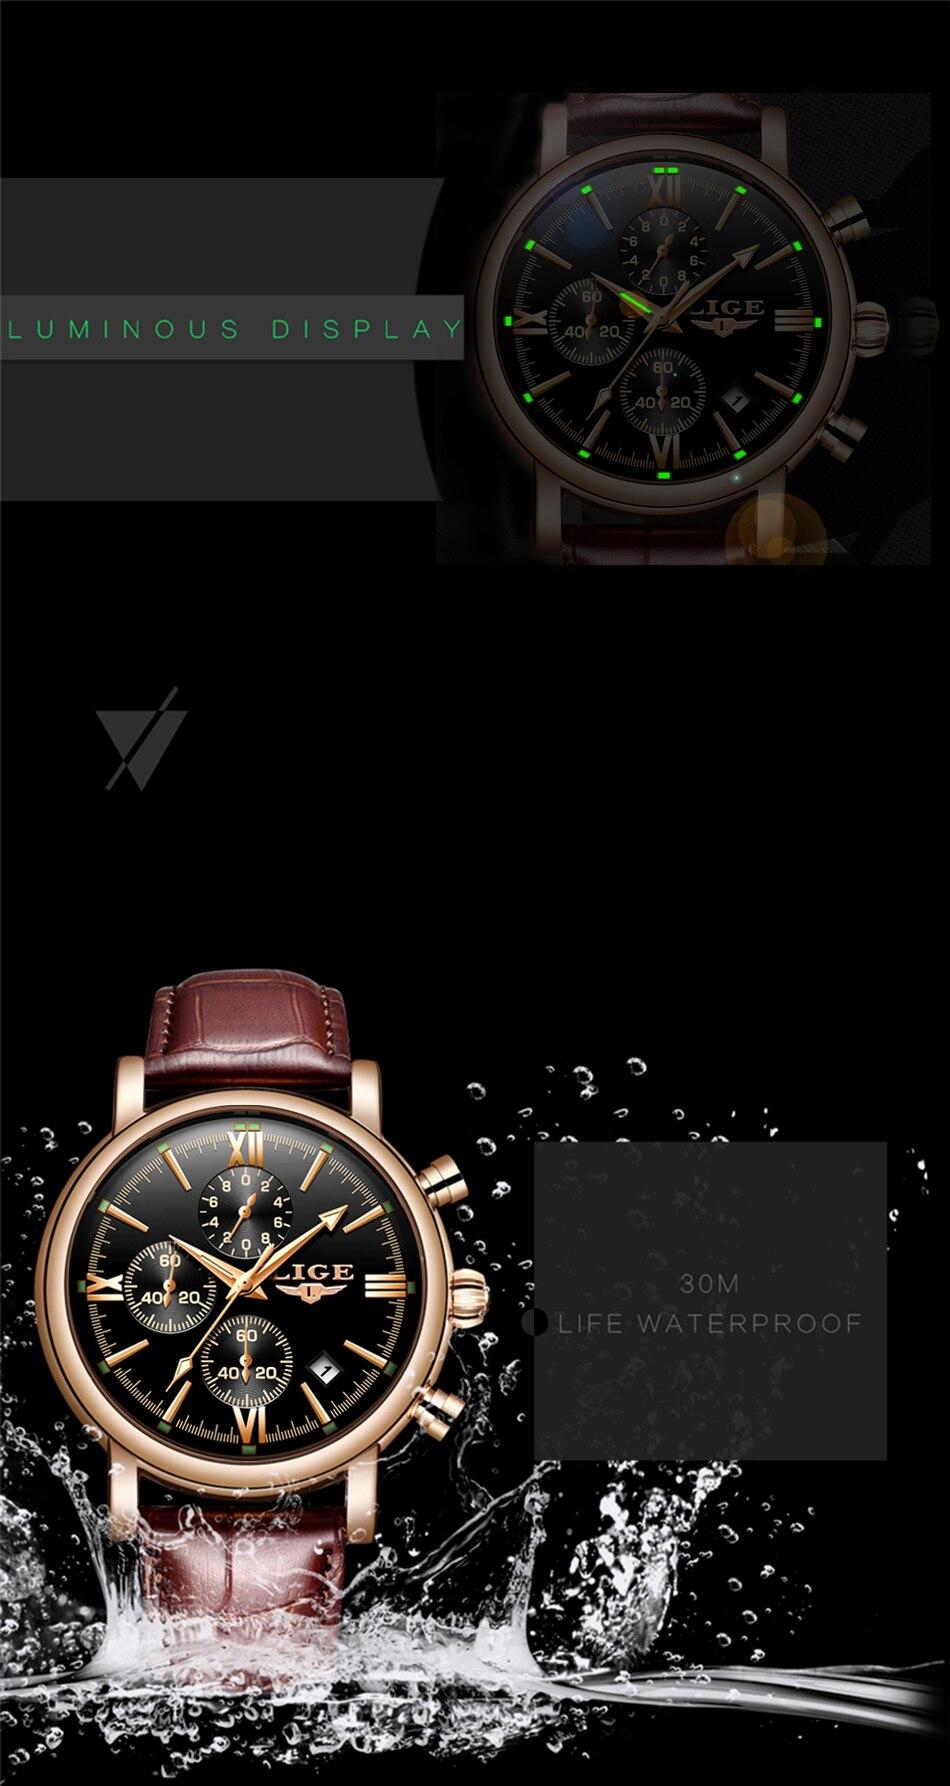 HTB1LLMVaFY7gK0jSZKzq6yikpXaA 2019 LIGE Business Leather Fashion Waterproof Quartz Watch For Mens Watches Top Brand Luxury Male Date Clock Relogio Masculino